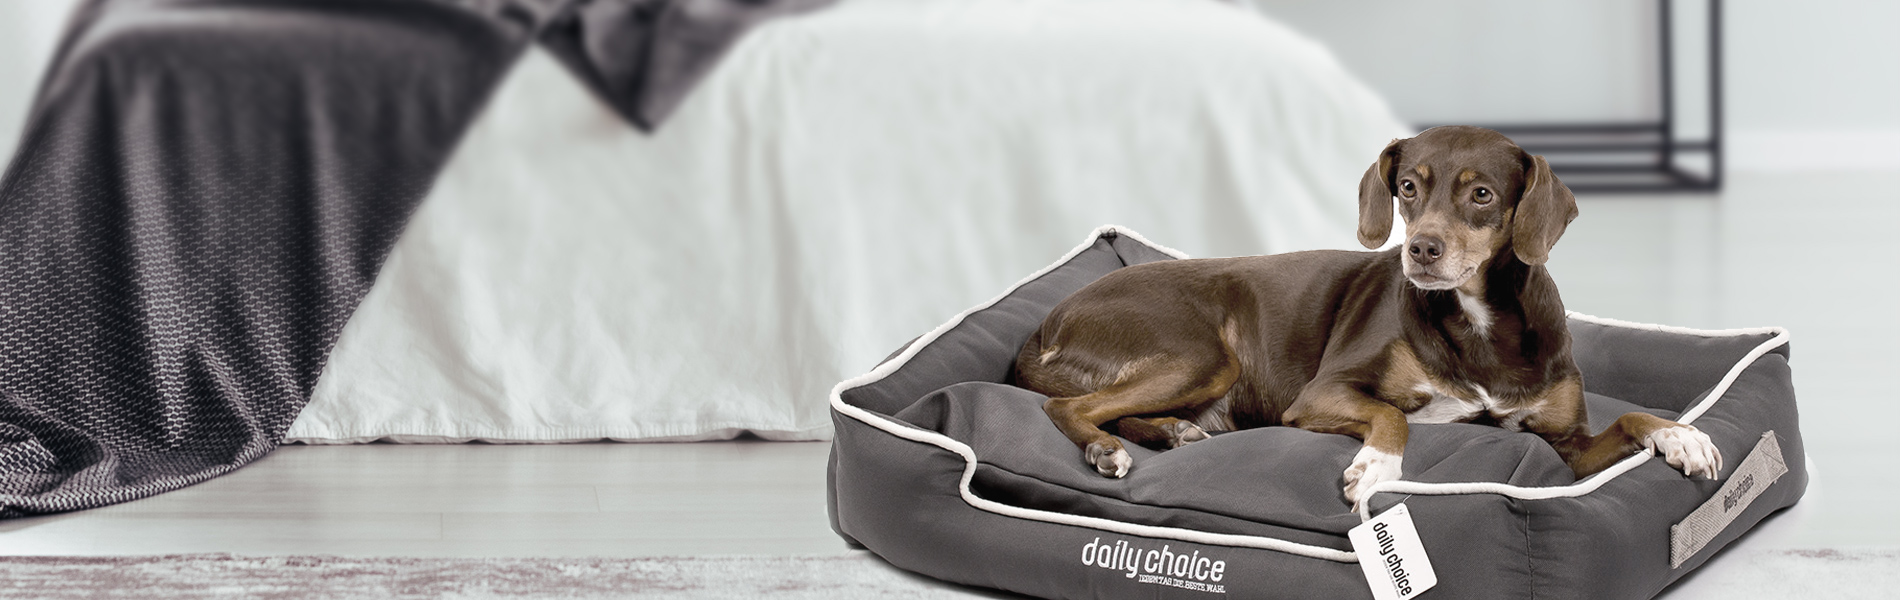 daily choice Hundebett Kuschelkoje jeden Tag